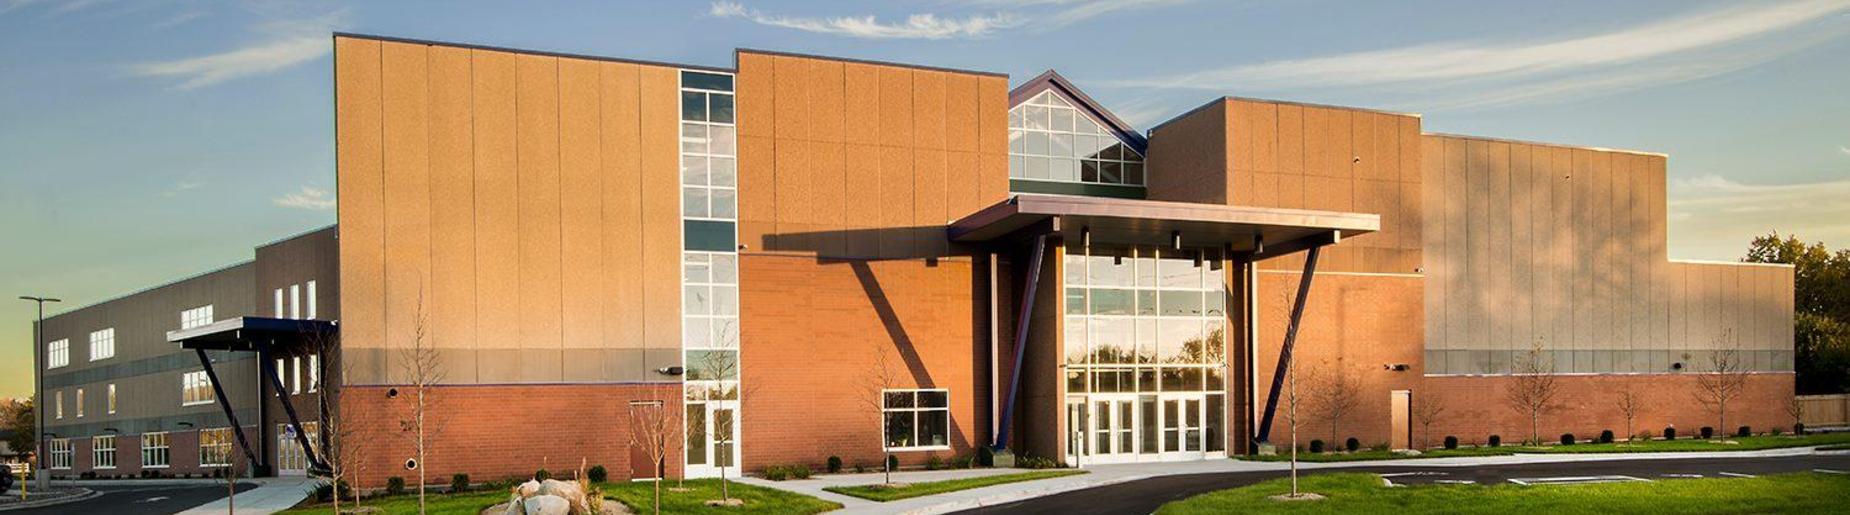 New Millennium Academy Building